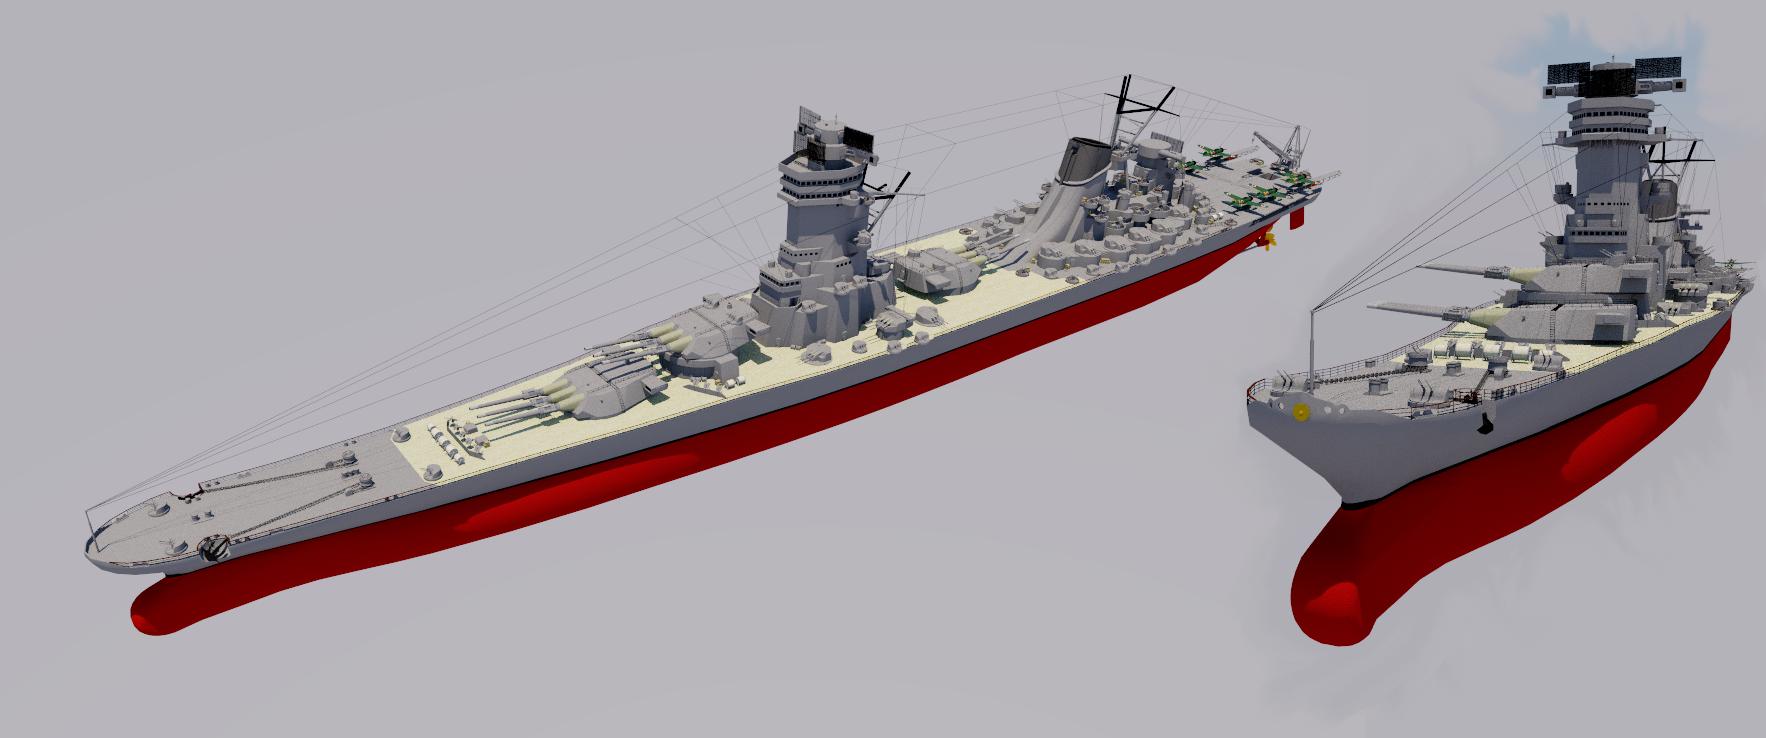 Yamato class battleship g3n3 configuration by theocomm on deviantart yamato class battleship g3n3 configuration by theocomm malvernweather Images